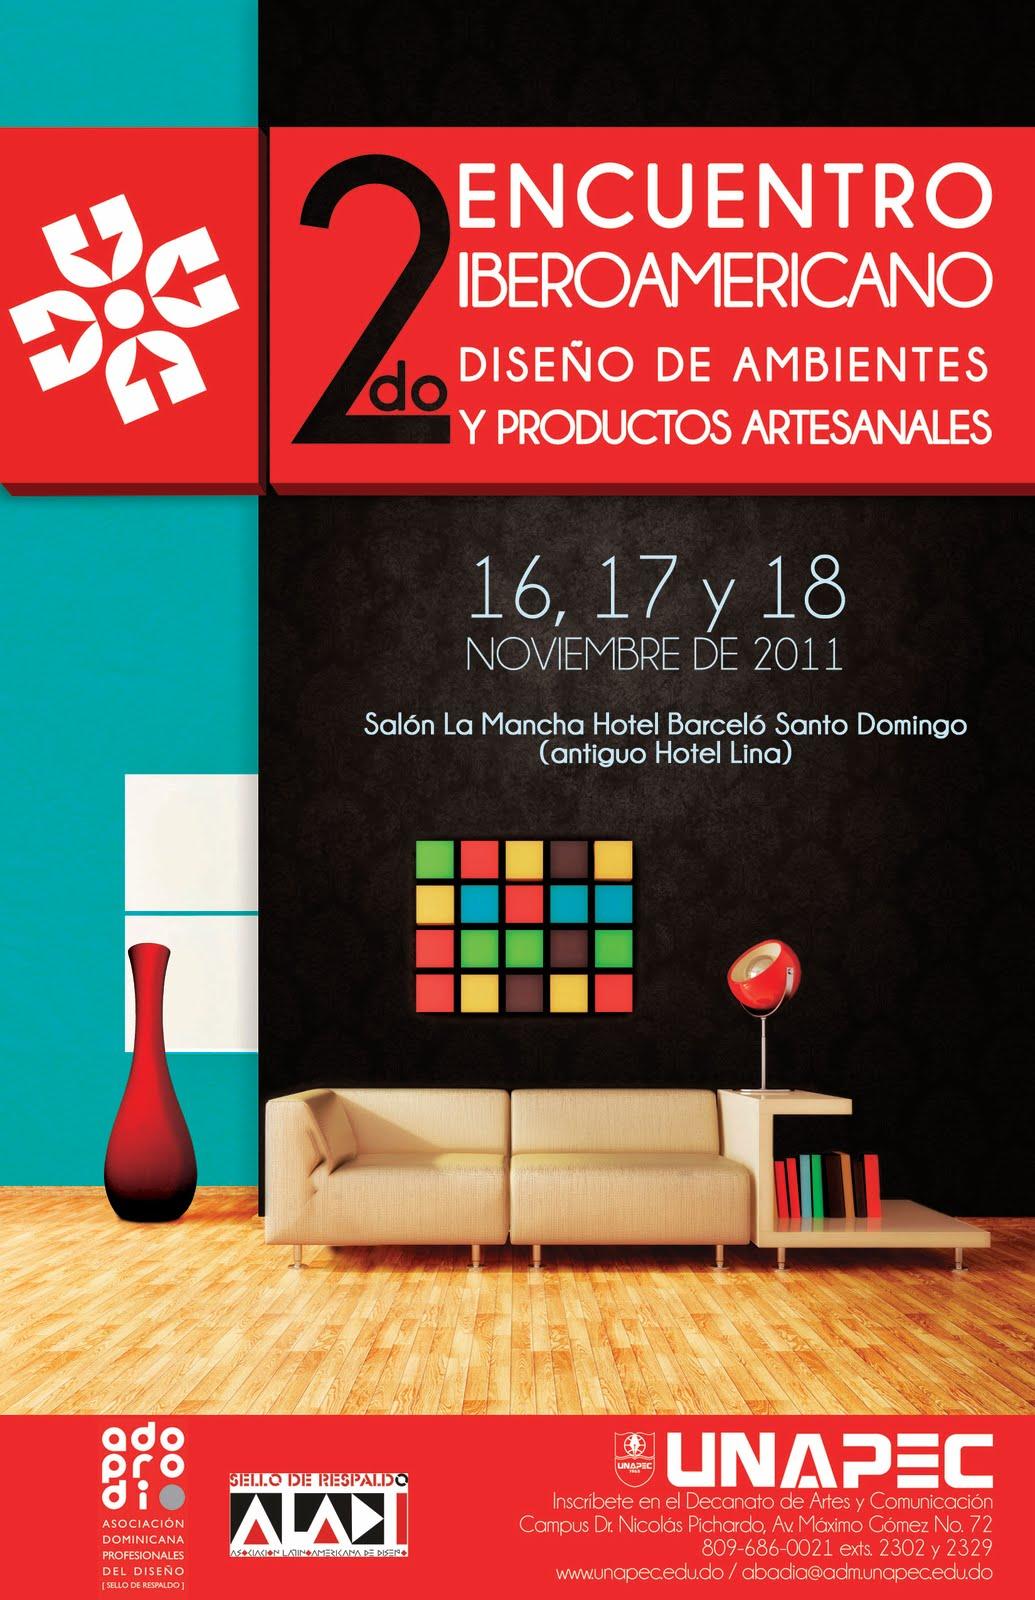 Adoprodi aladi rep blica dominicana segundo encuentro Diseno de ambientes y arquitectura de interiores